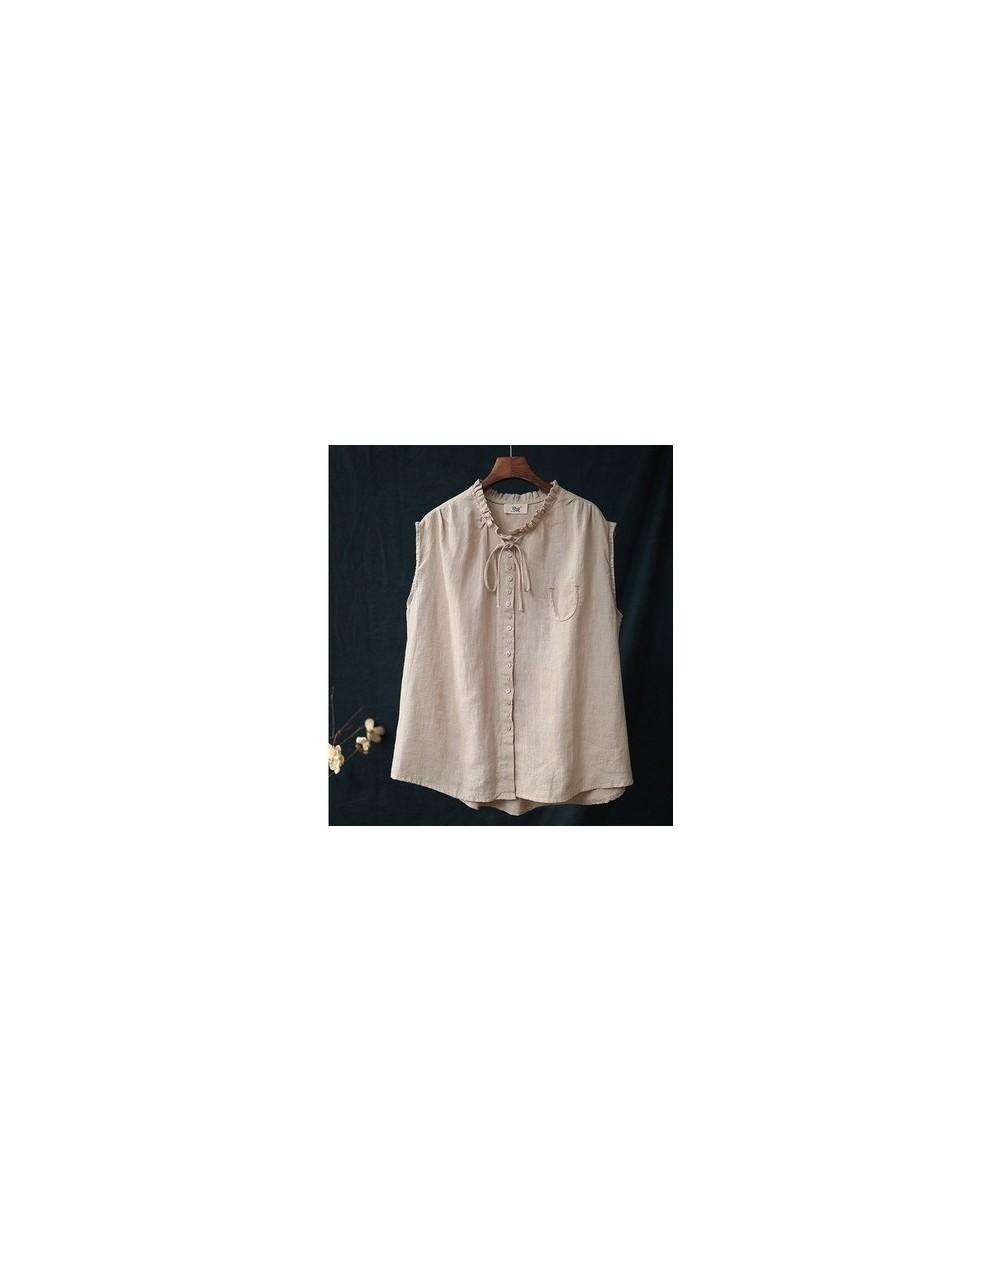 Casual Style Shirts Art ear-collar Solid Linen Sleeveless Female Blouse 2019 Summer Fashion Button Loose Women Blouse - Beig...